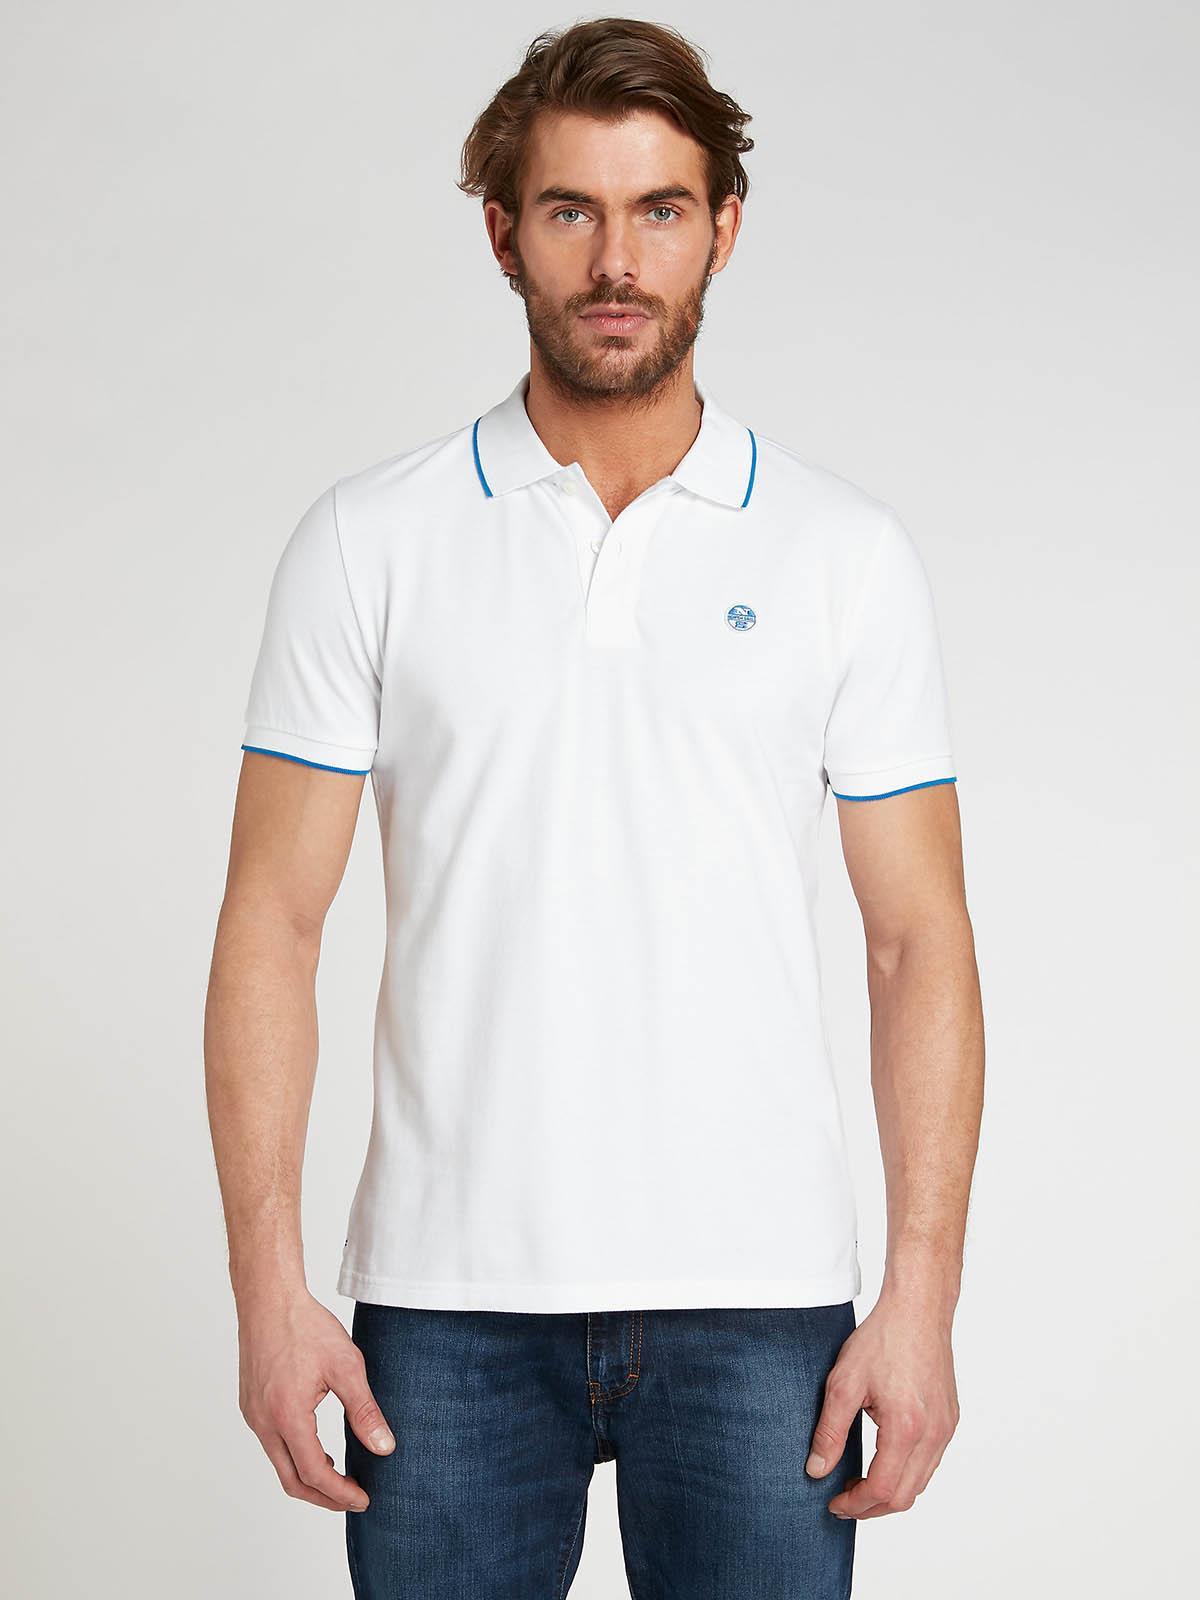 NEW-North-Sails-Legacy-Heritage-Mens-Cotton-Polo-Shirt-Top-Size-S-M-L-XL-XXL-3XL thumbnail 6